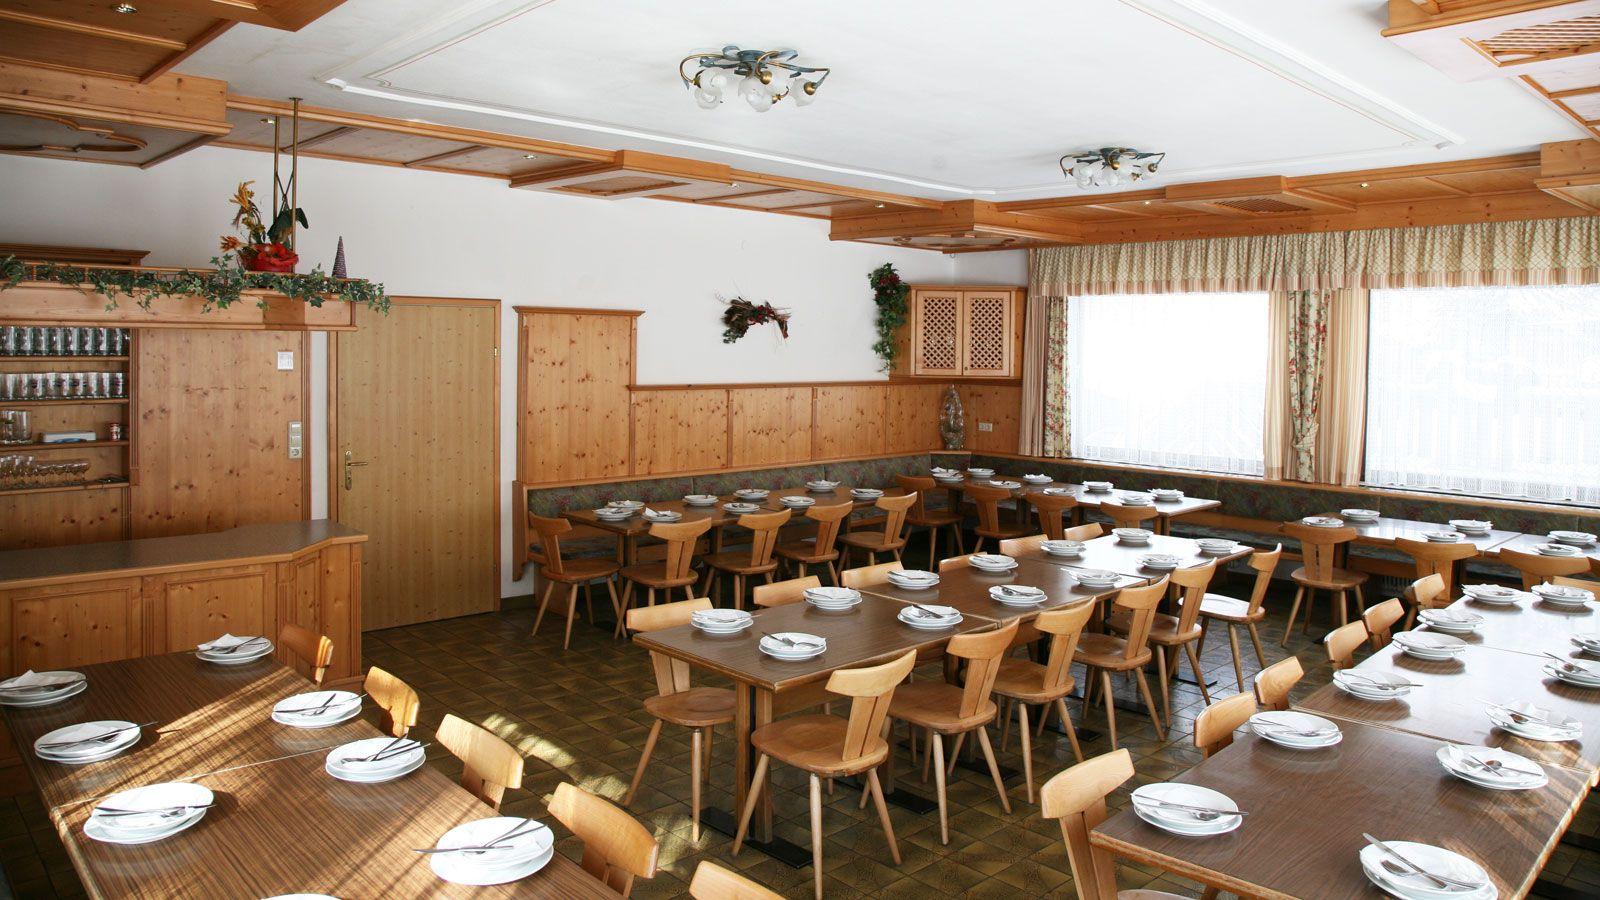 Jugendhotel Wiederkehr School Ski Trip Accommodation : SS G Ski Austria Hotel Salzburger Sportwelt Jugenhotel Wiederkehr Dining Room from www.pgl.co.uk size 1600 x 900 jpeg 239kB